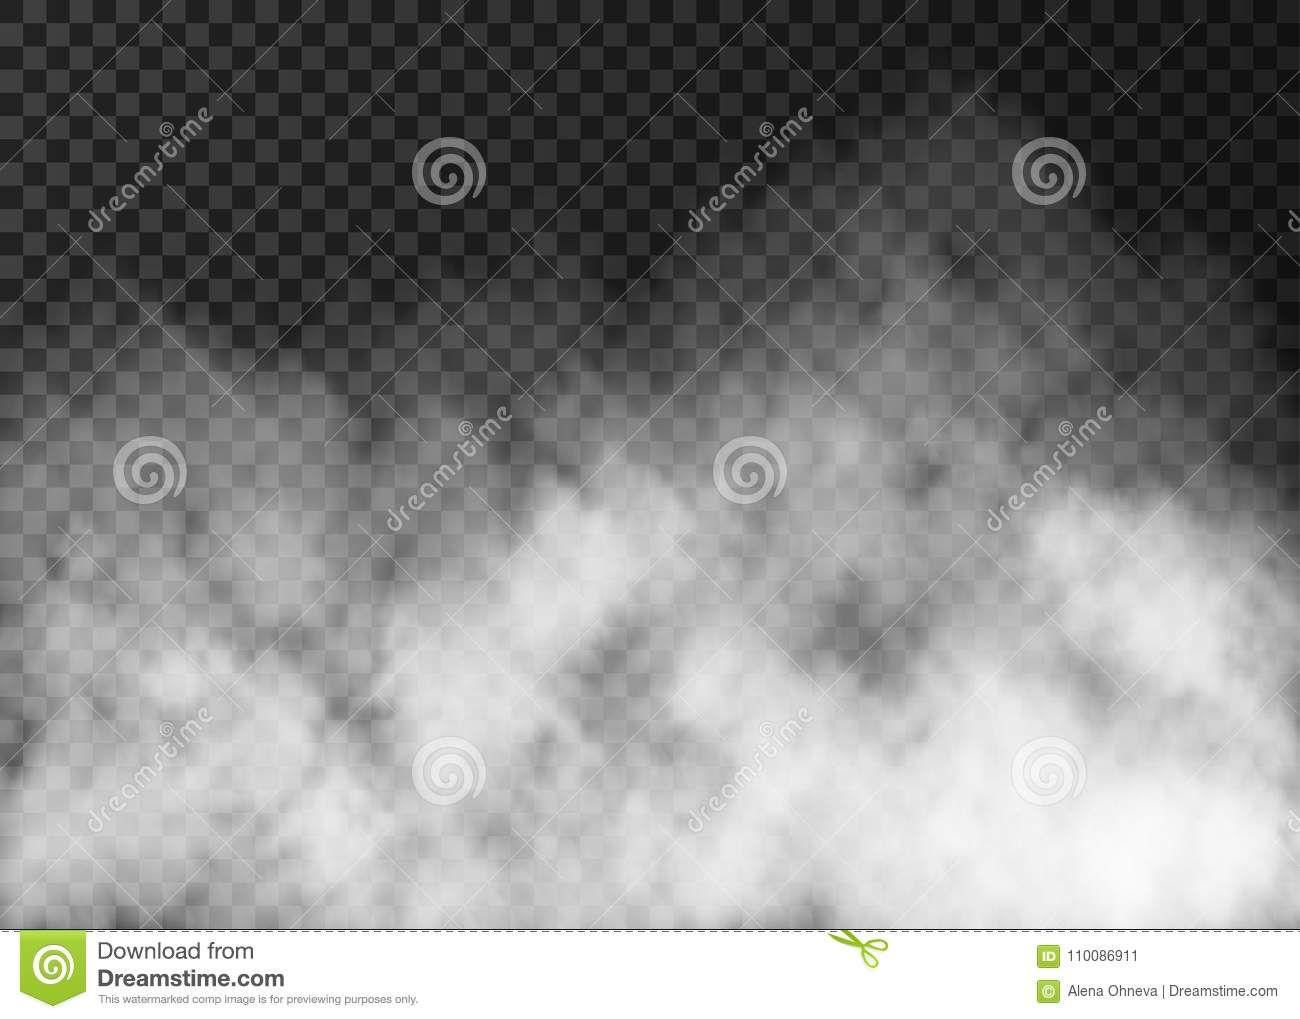 Fog clipart realistic smoke. White texture on transparent